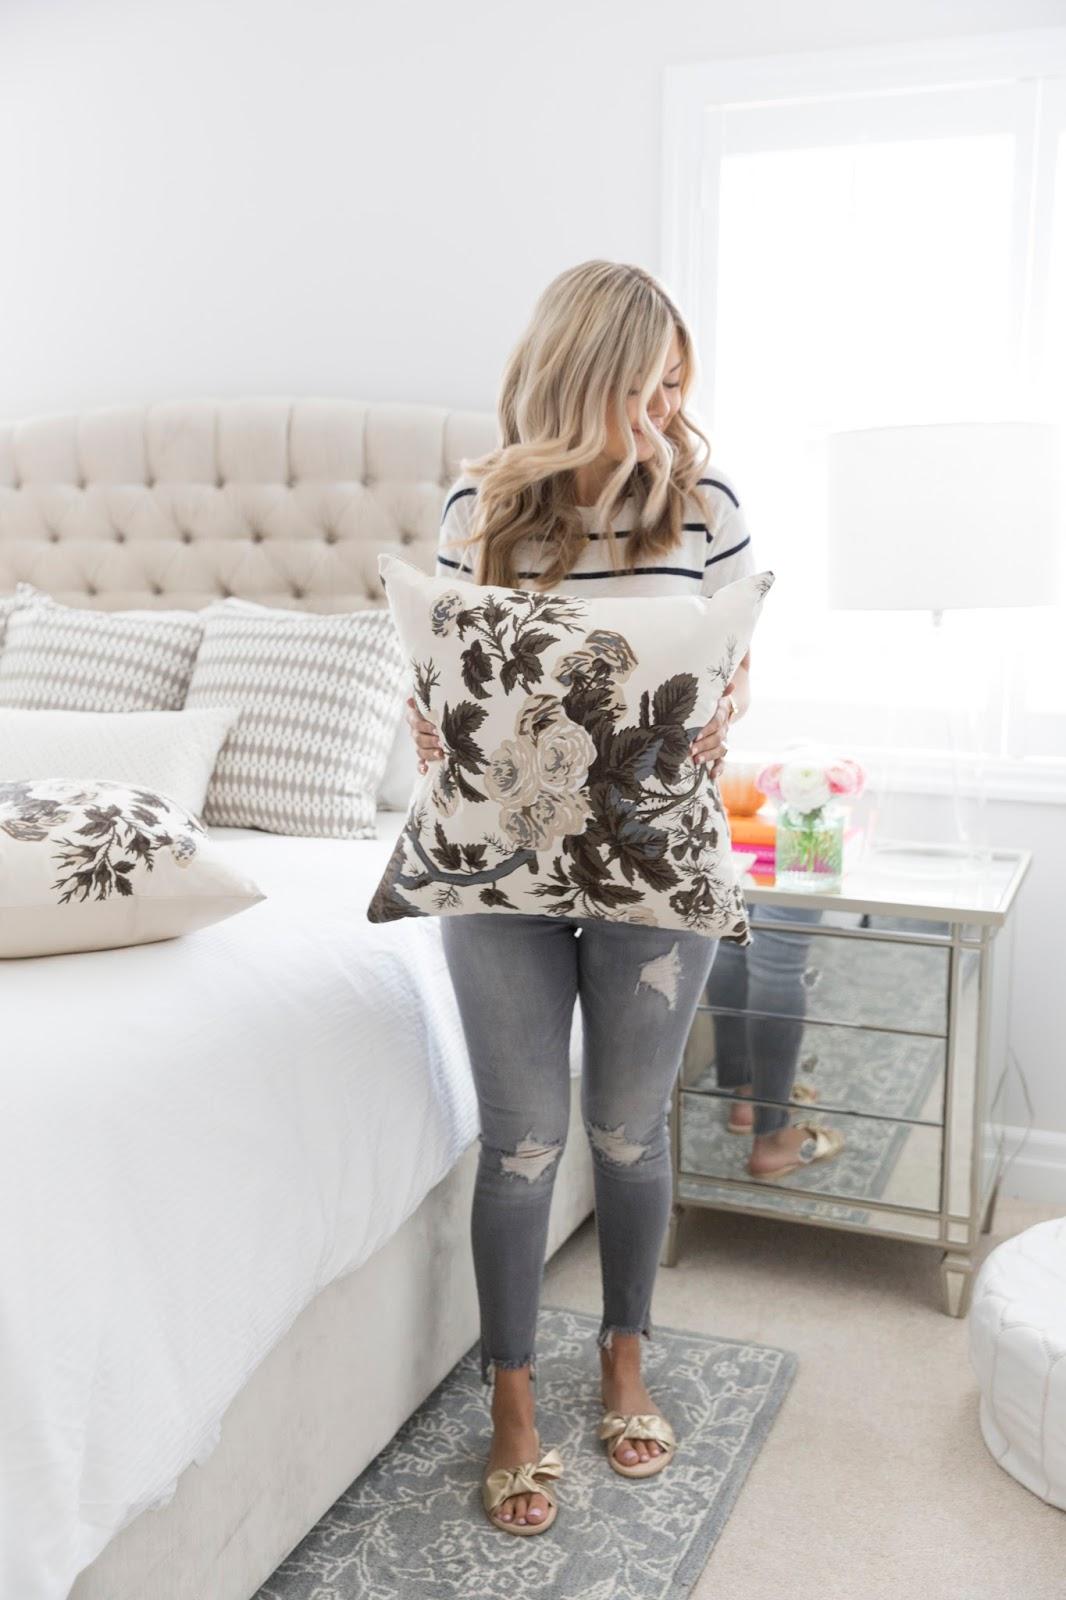 Sealy Posturepedic Gel Pillow Review